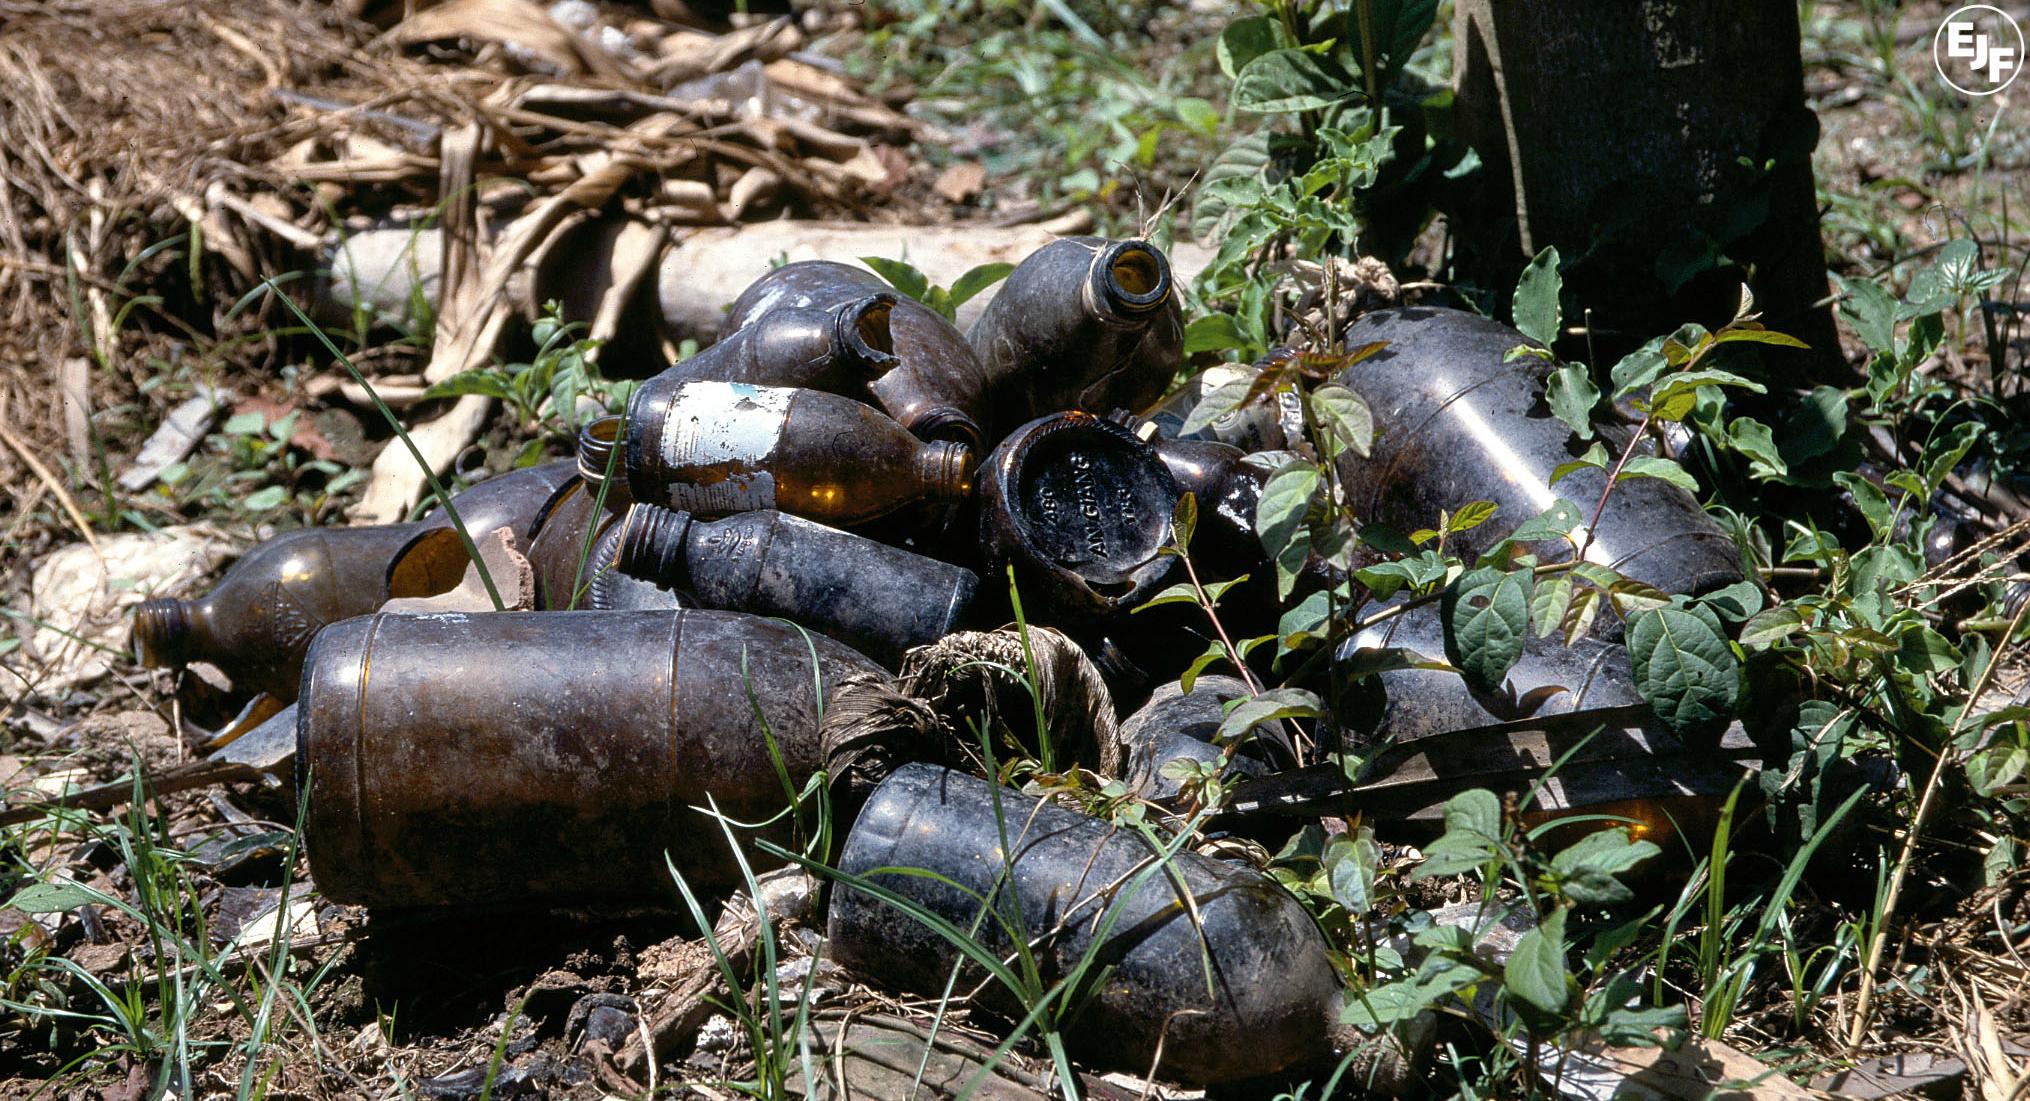 Paraguay bans endosulfan